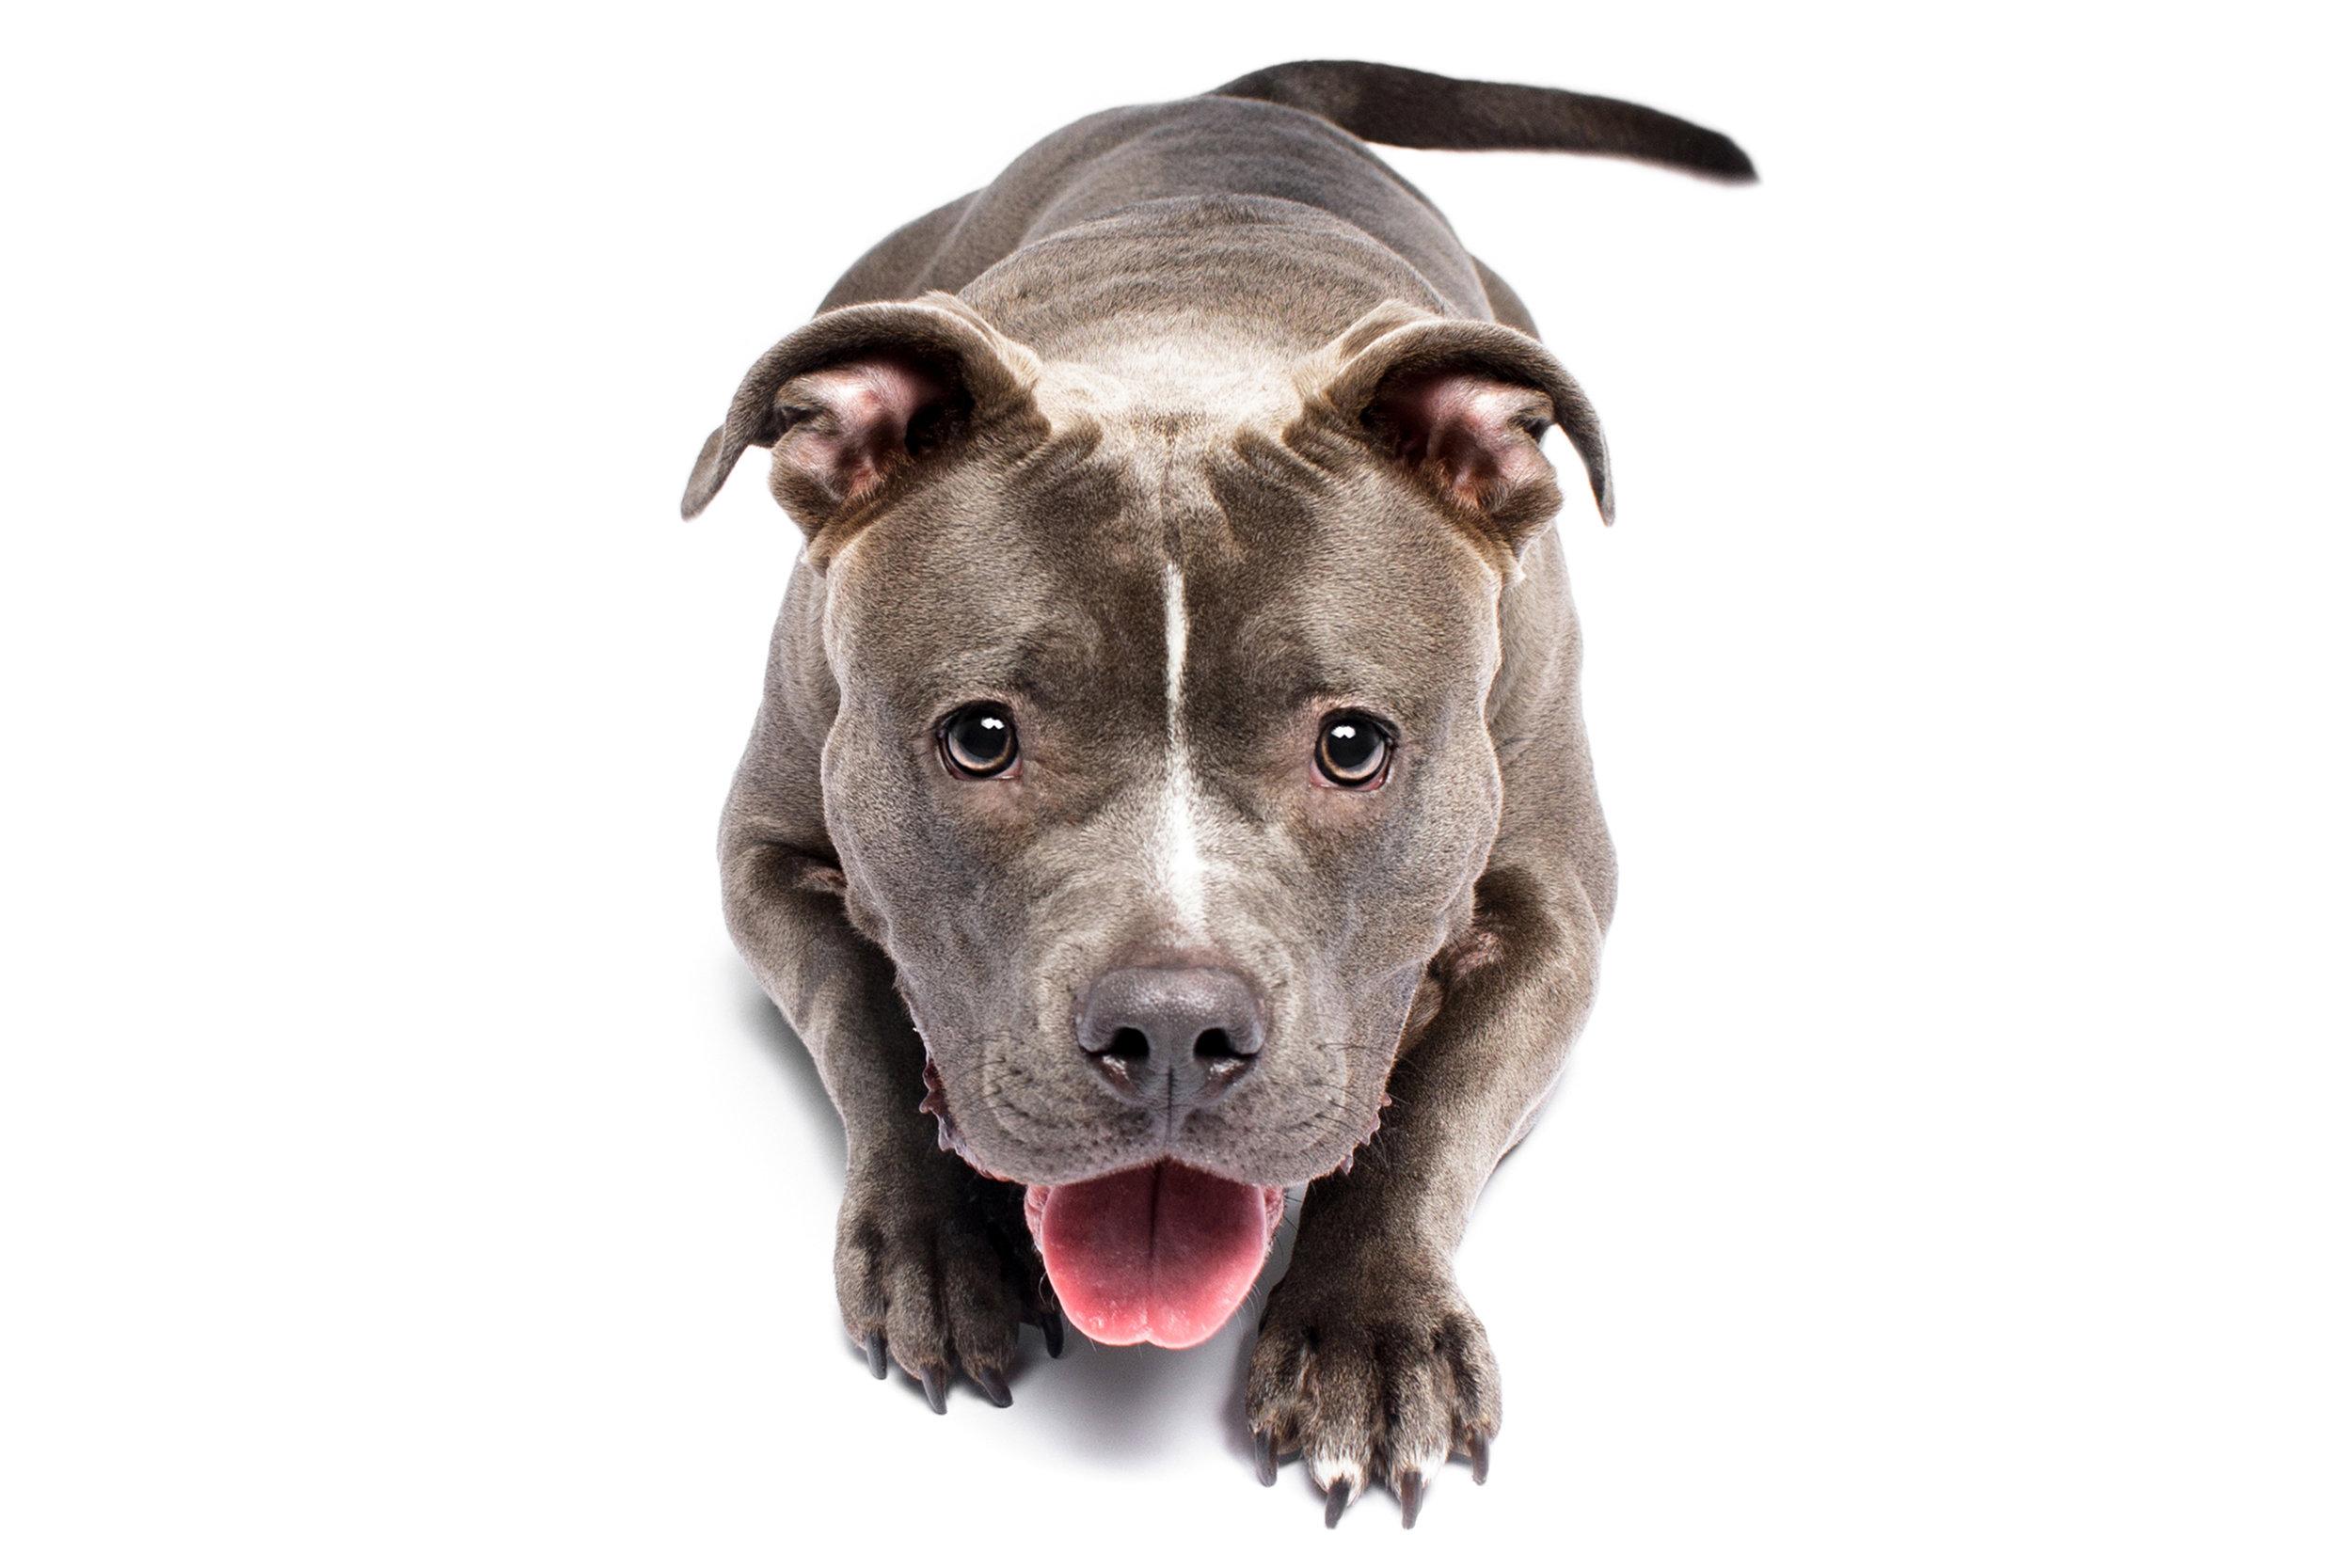 Kali the Blue Nose American Bully/Pitbull Terrier